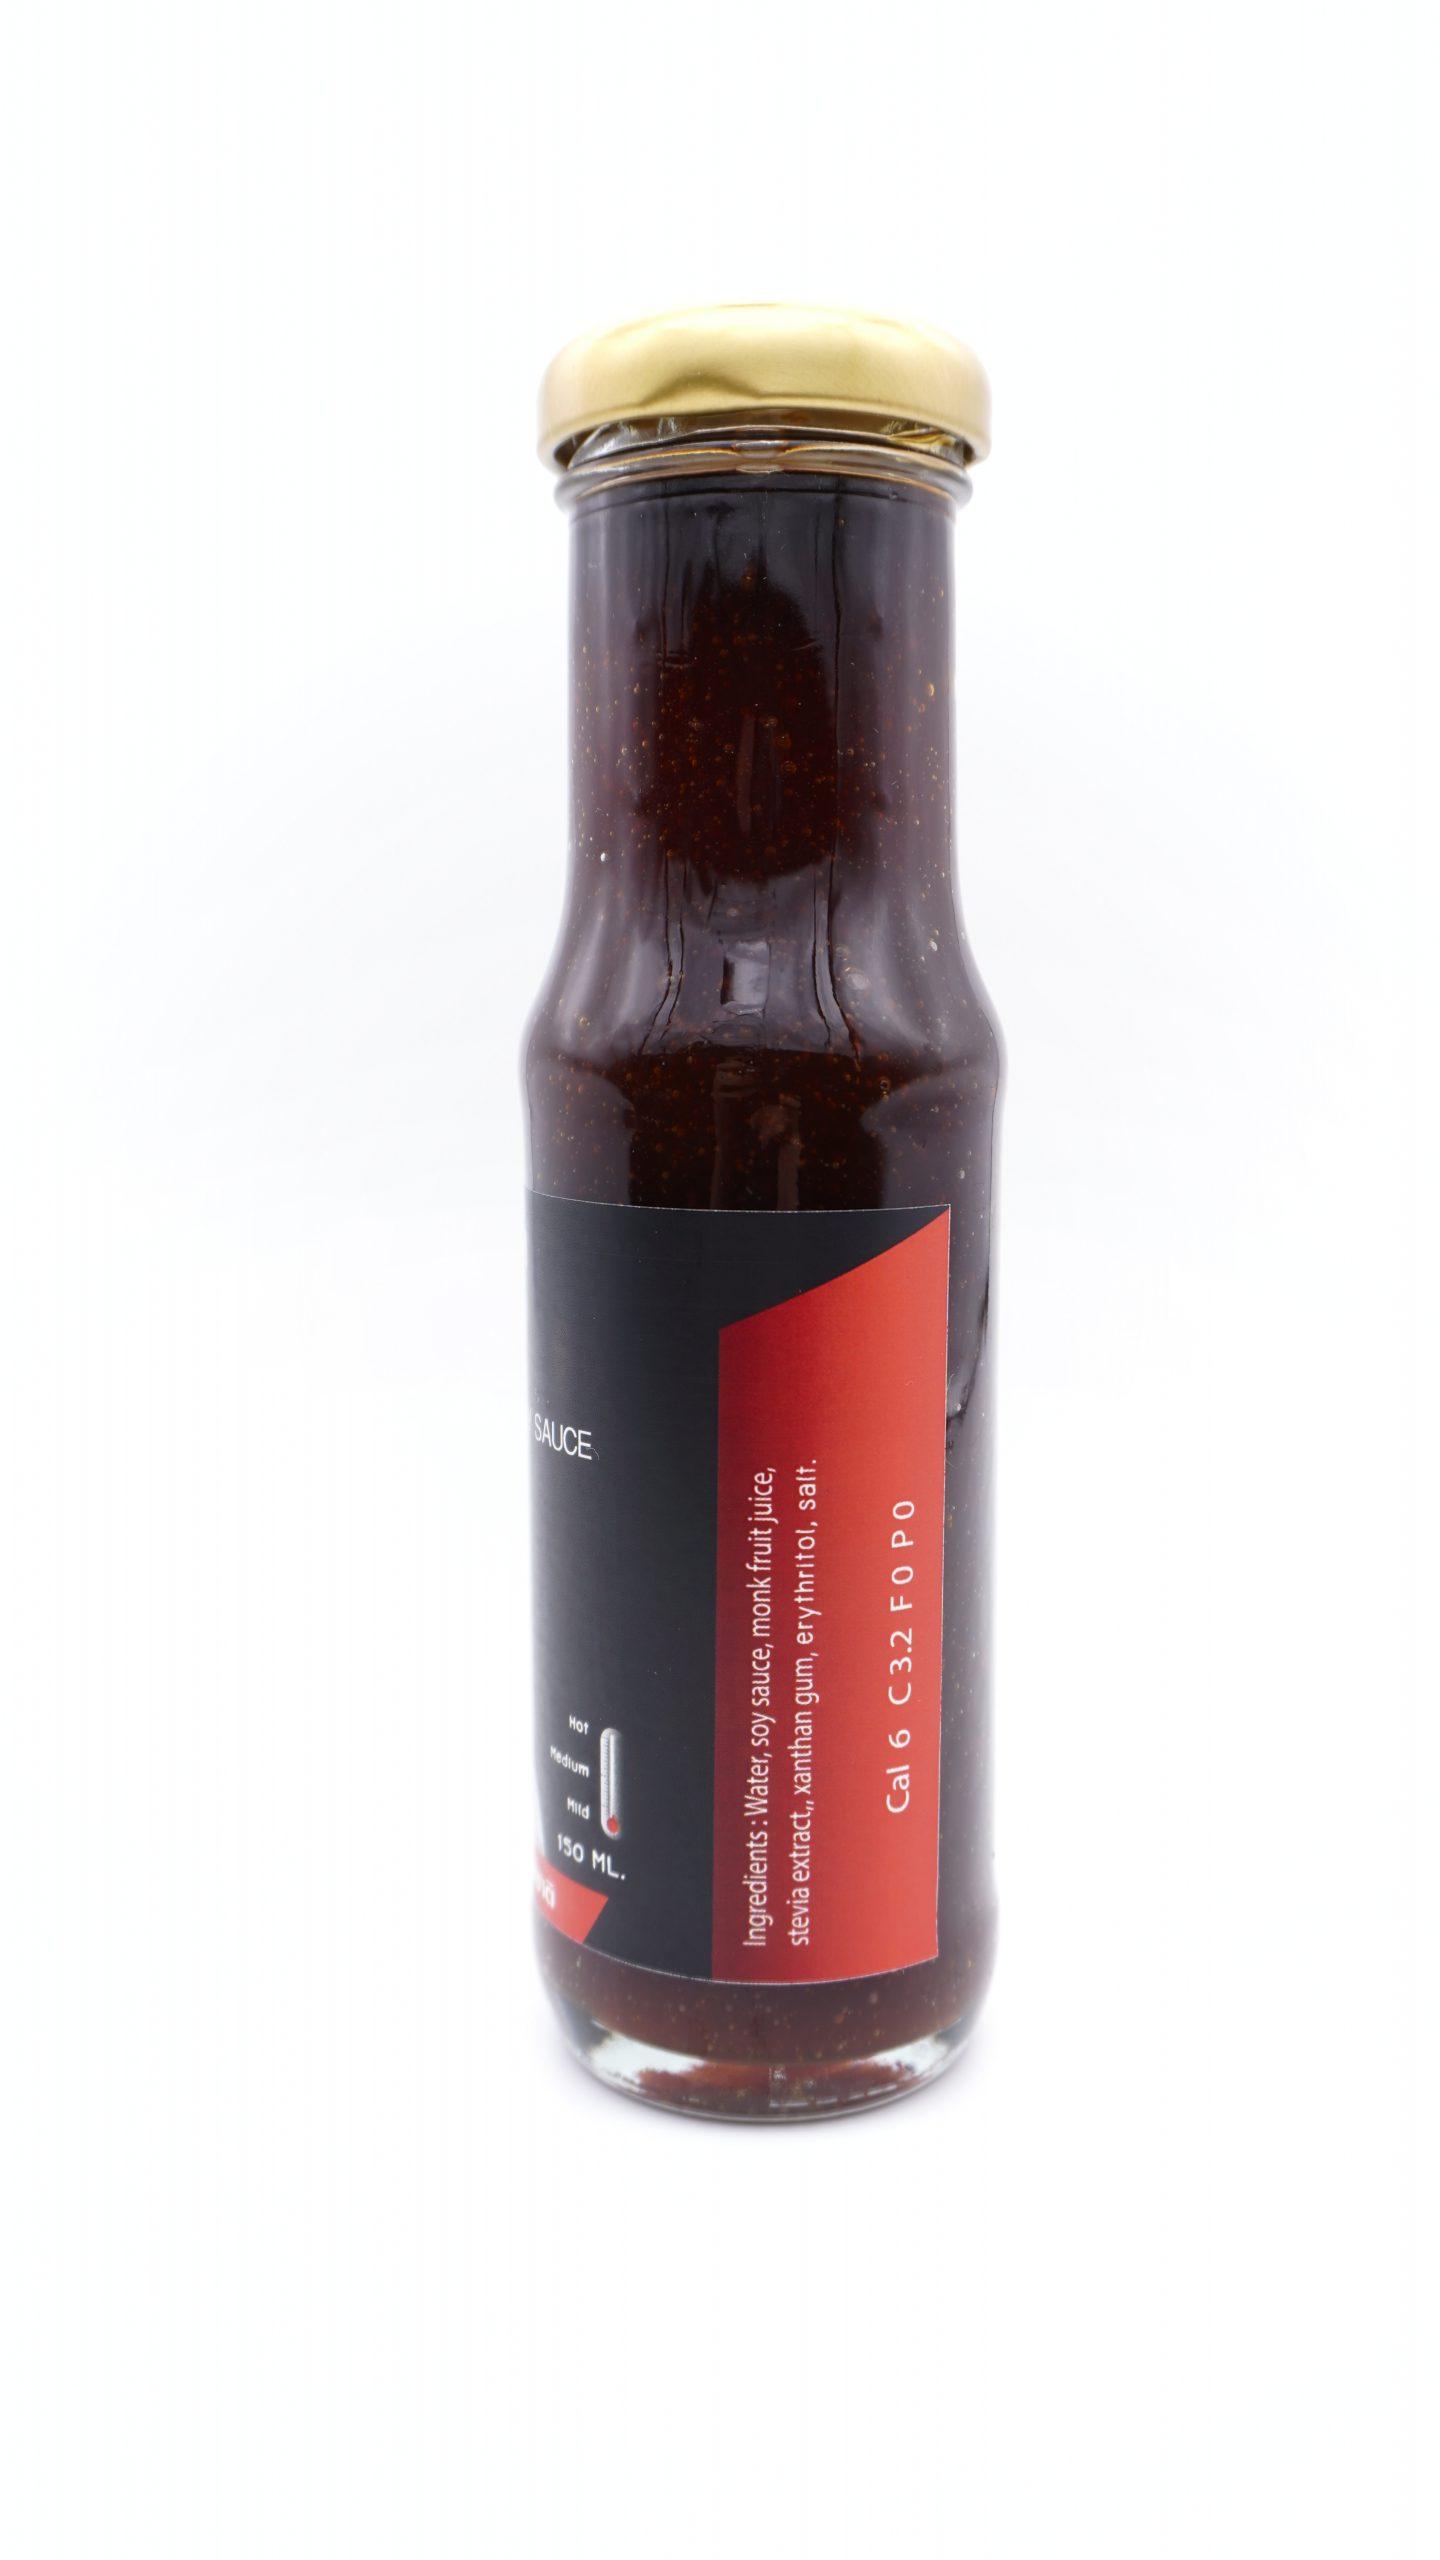 SUNTURI Keto Super Black Soy Sauce 150ml